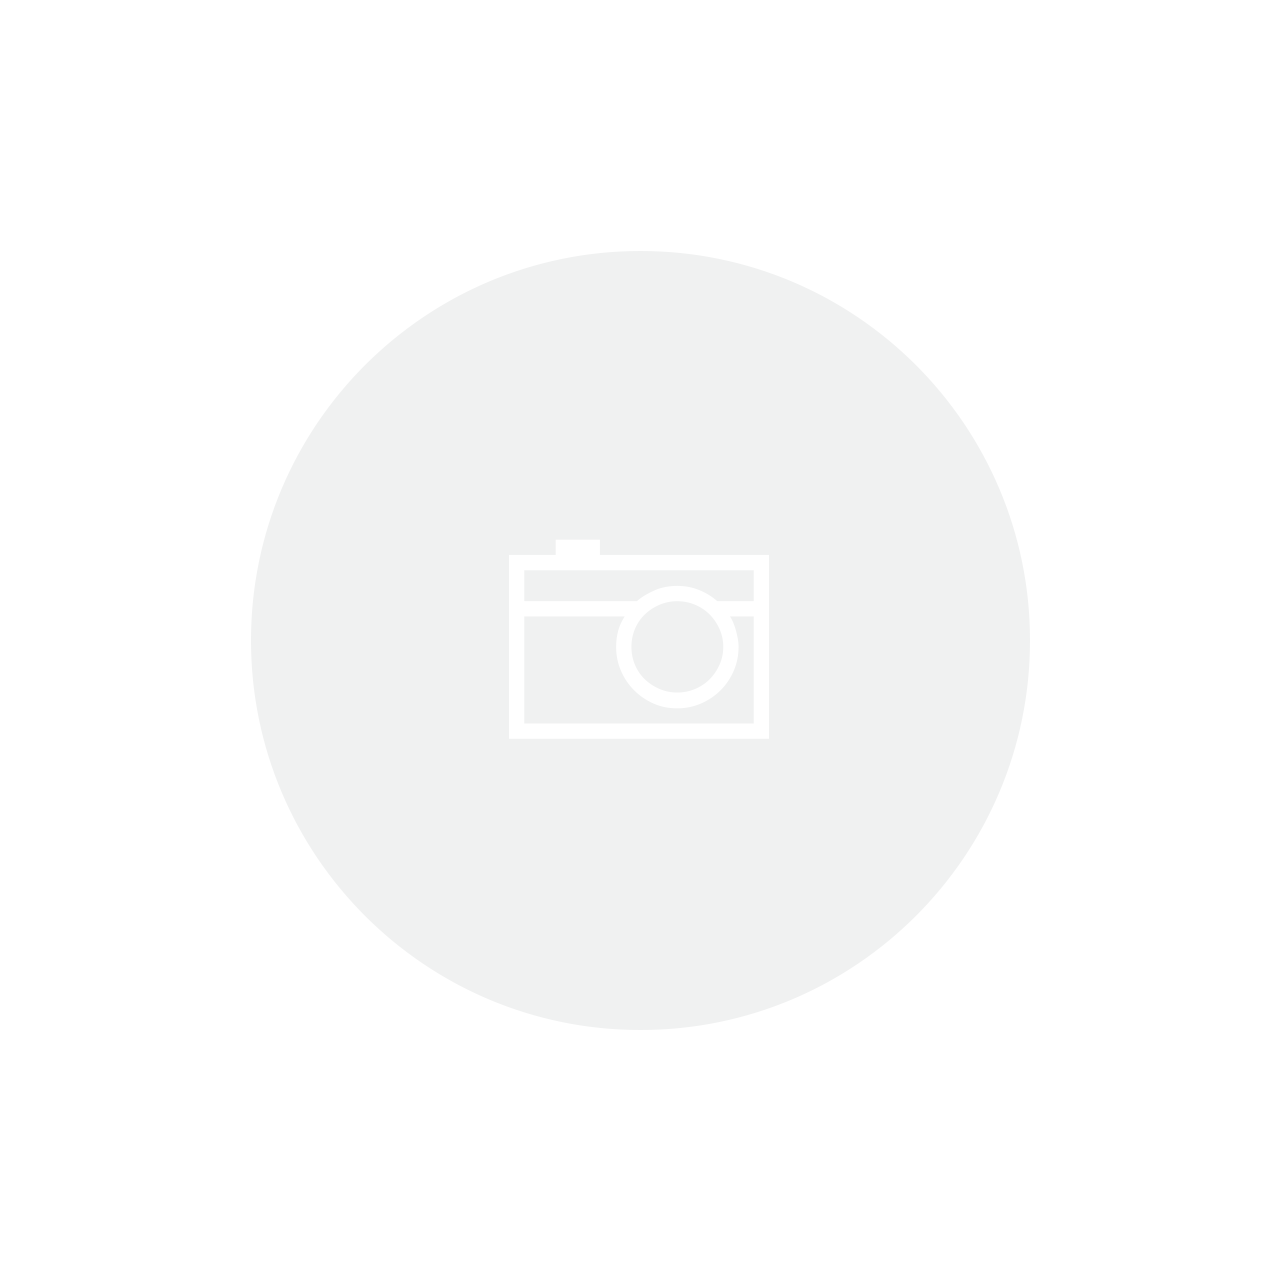 Placa de video ASUS Geforce GTX 1070 OC 8GB DDR5 256bits - STRIX-GTX1070-O8G-GAMING